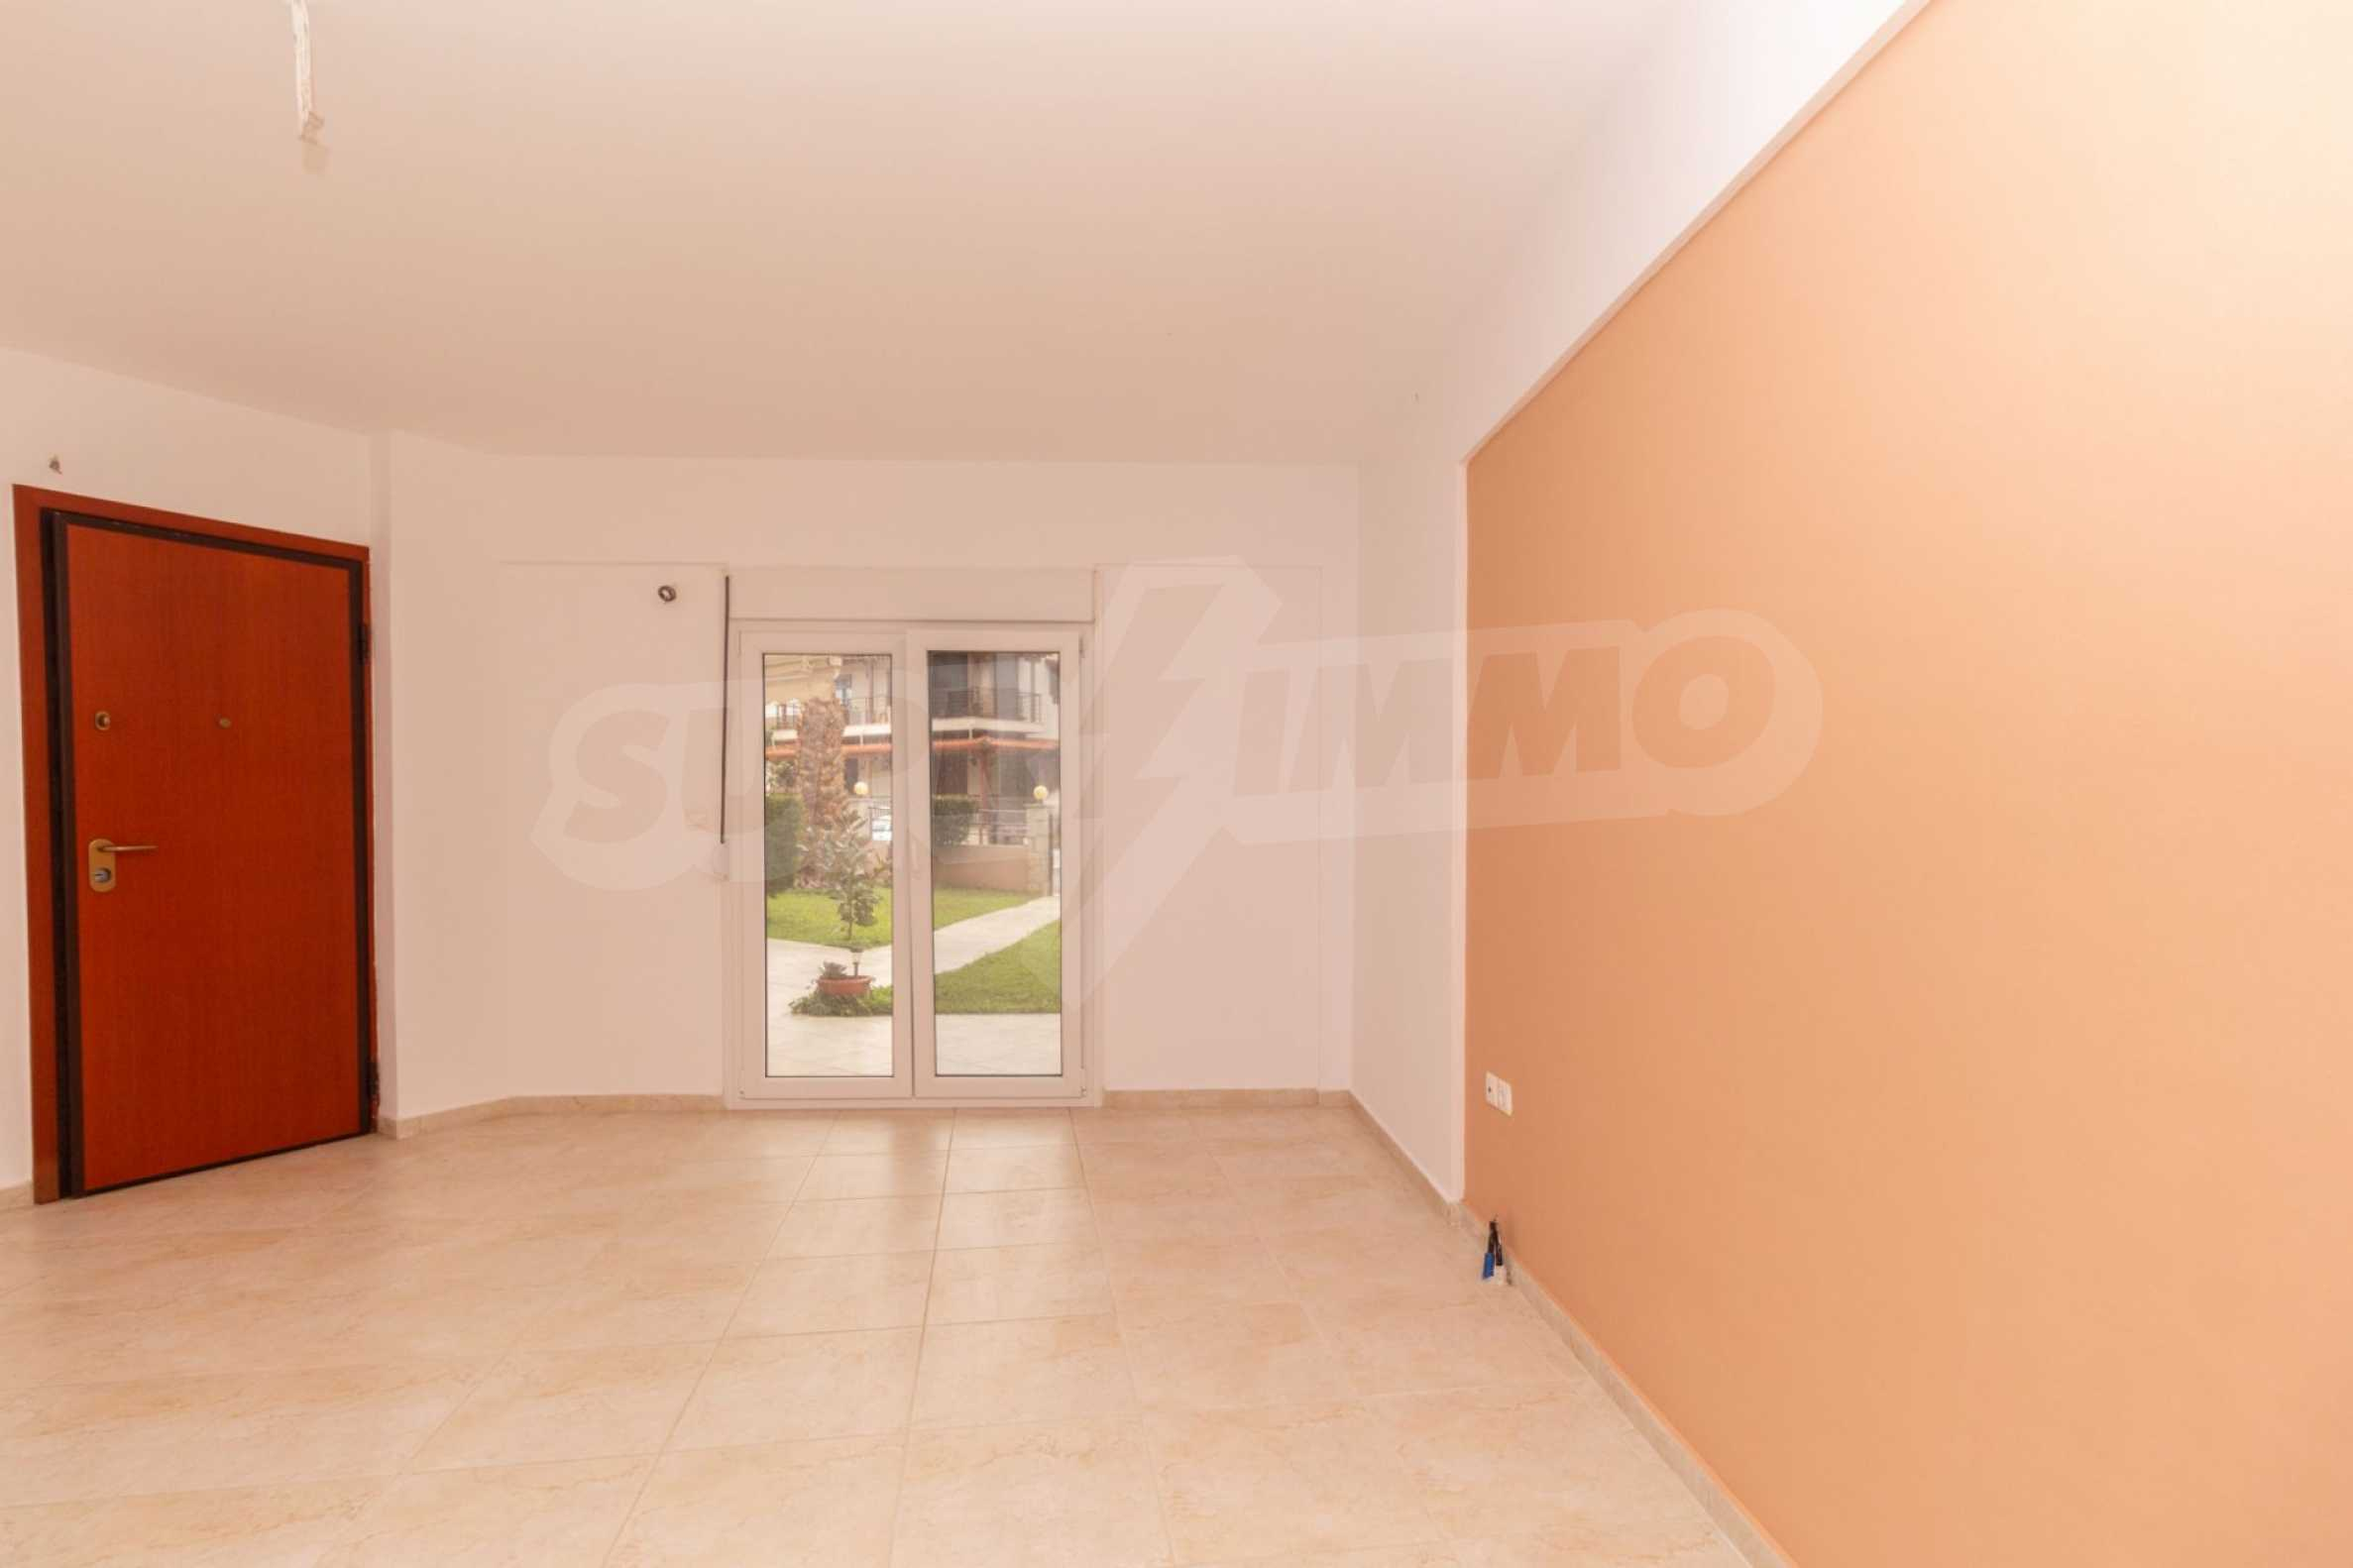 тристаен апартамент в Потидея, Касандра 18